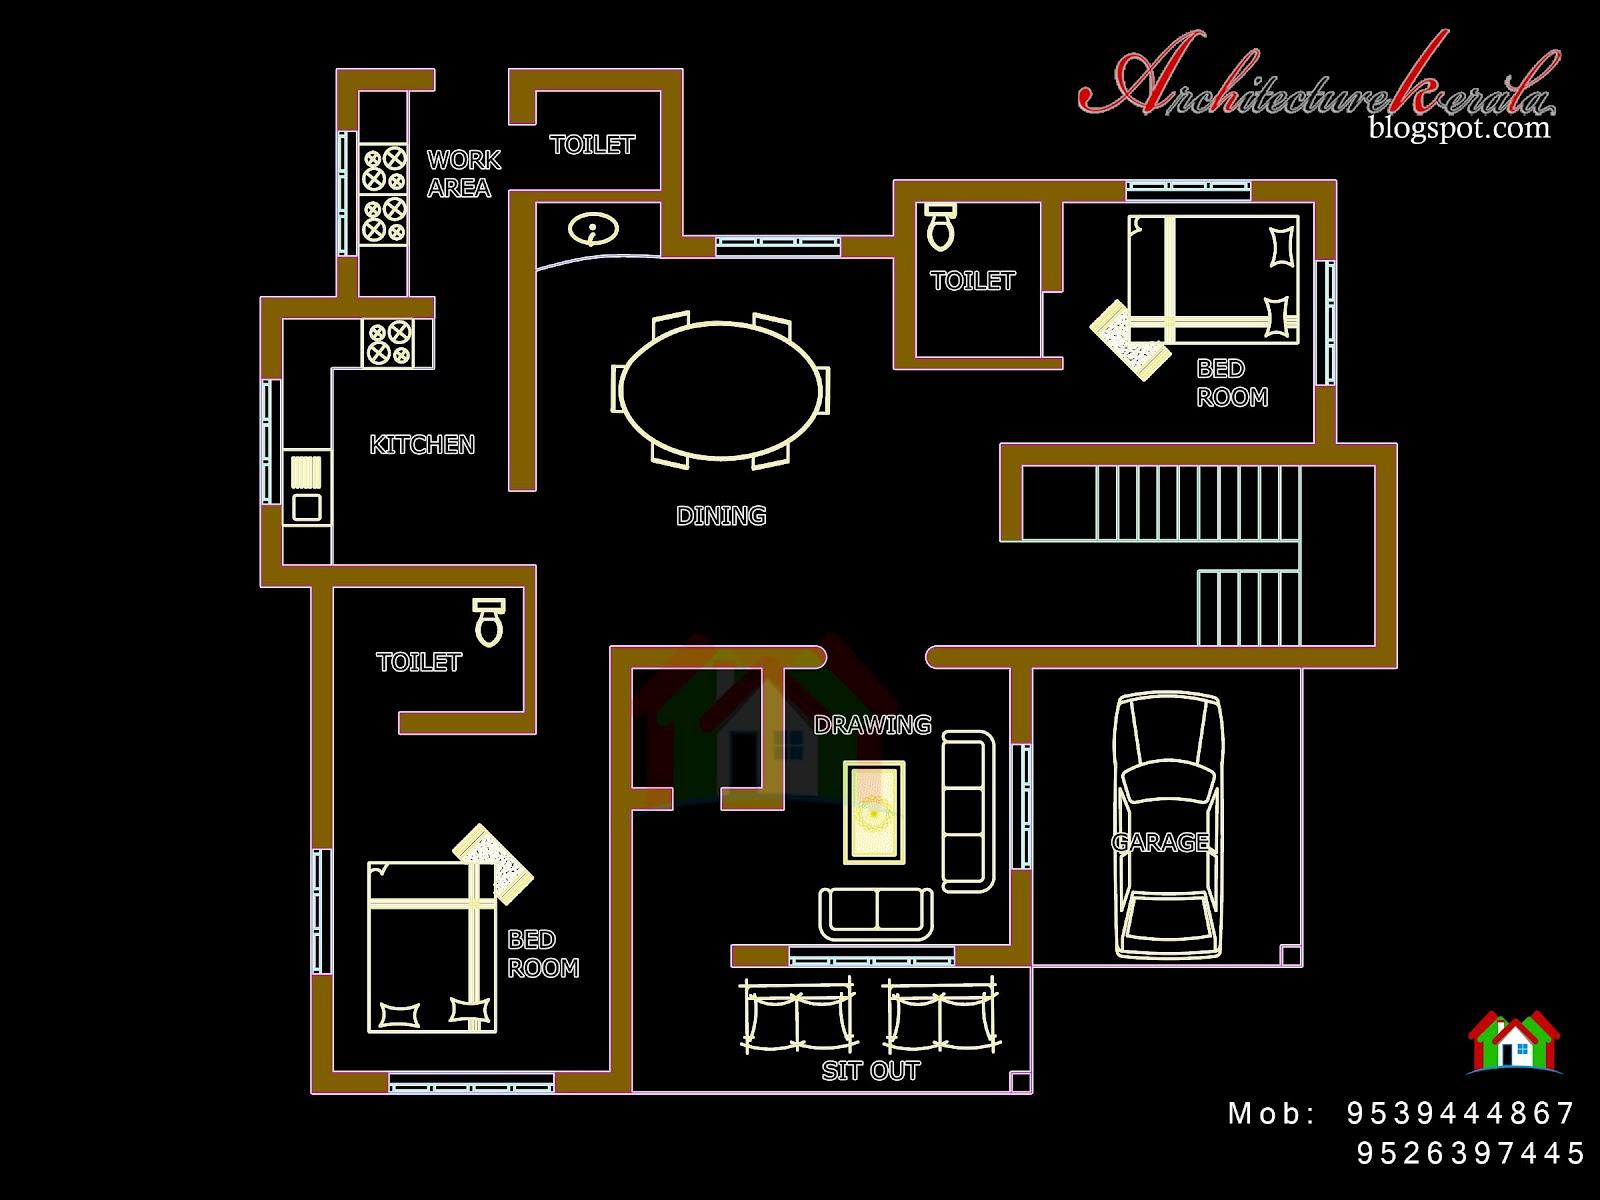 House plans kerala model free vastu house plans kerala lrg - Four Bedroom House Plan Kerala Style